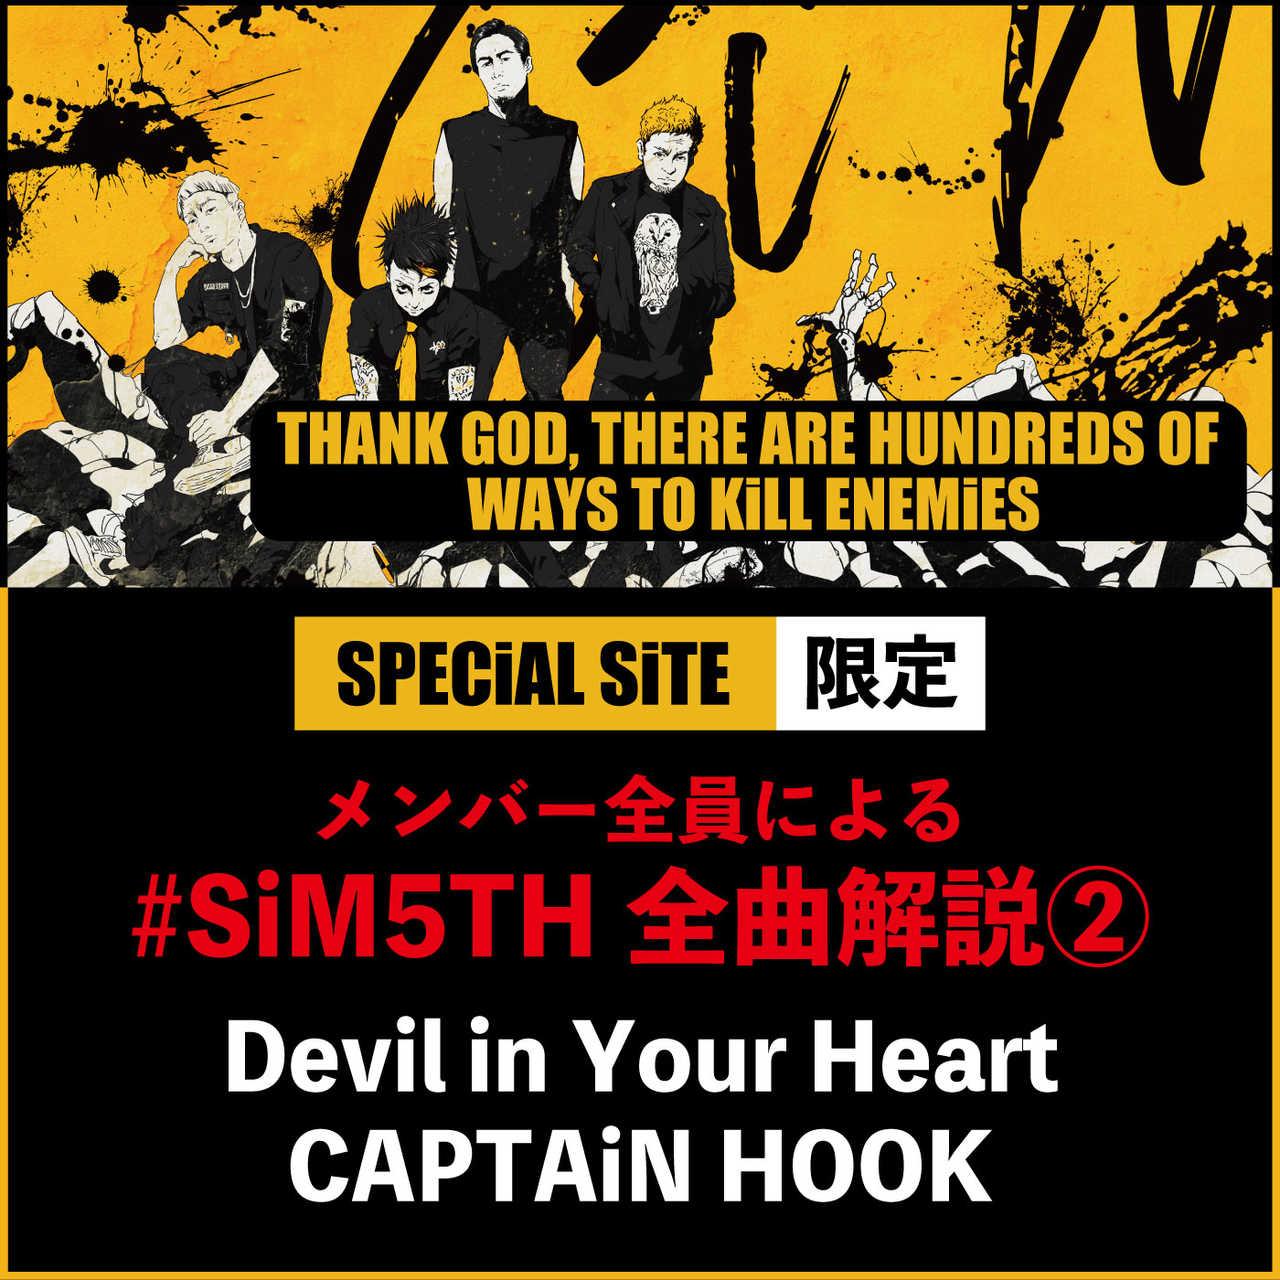 SiM、【メンバー全員によるアルバム全曲解説】第2弾「Devil in Your Heart」「CAPTAiN HOOK」公開!